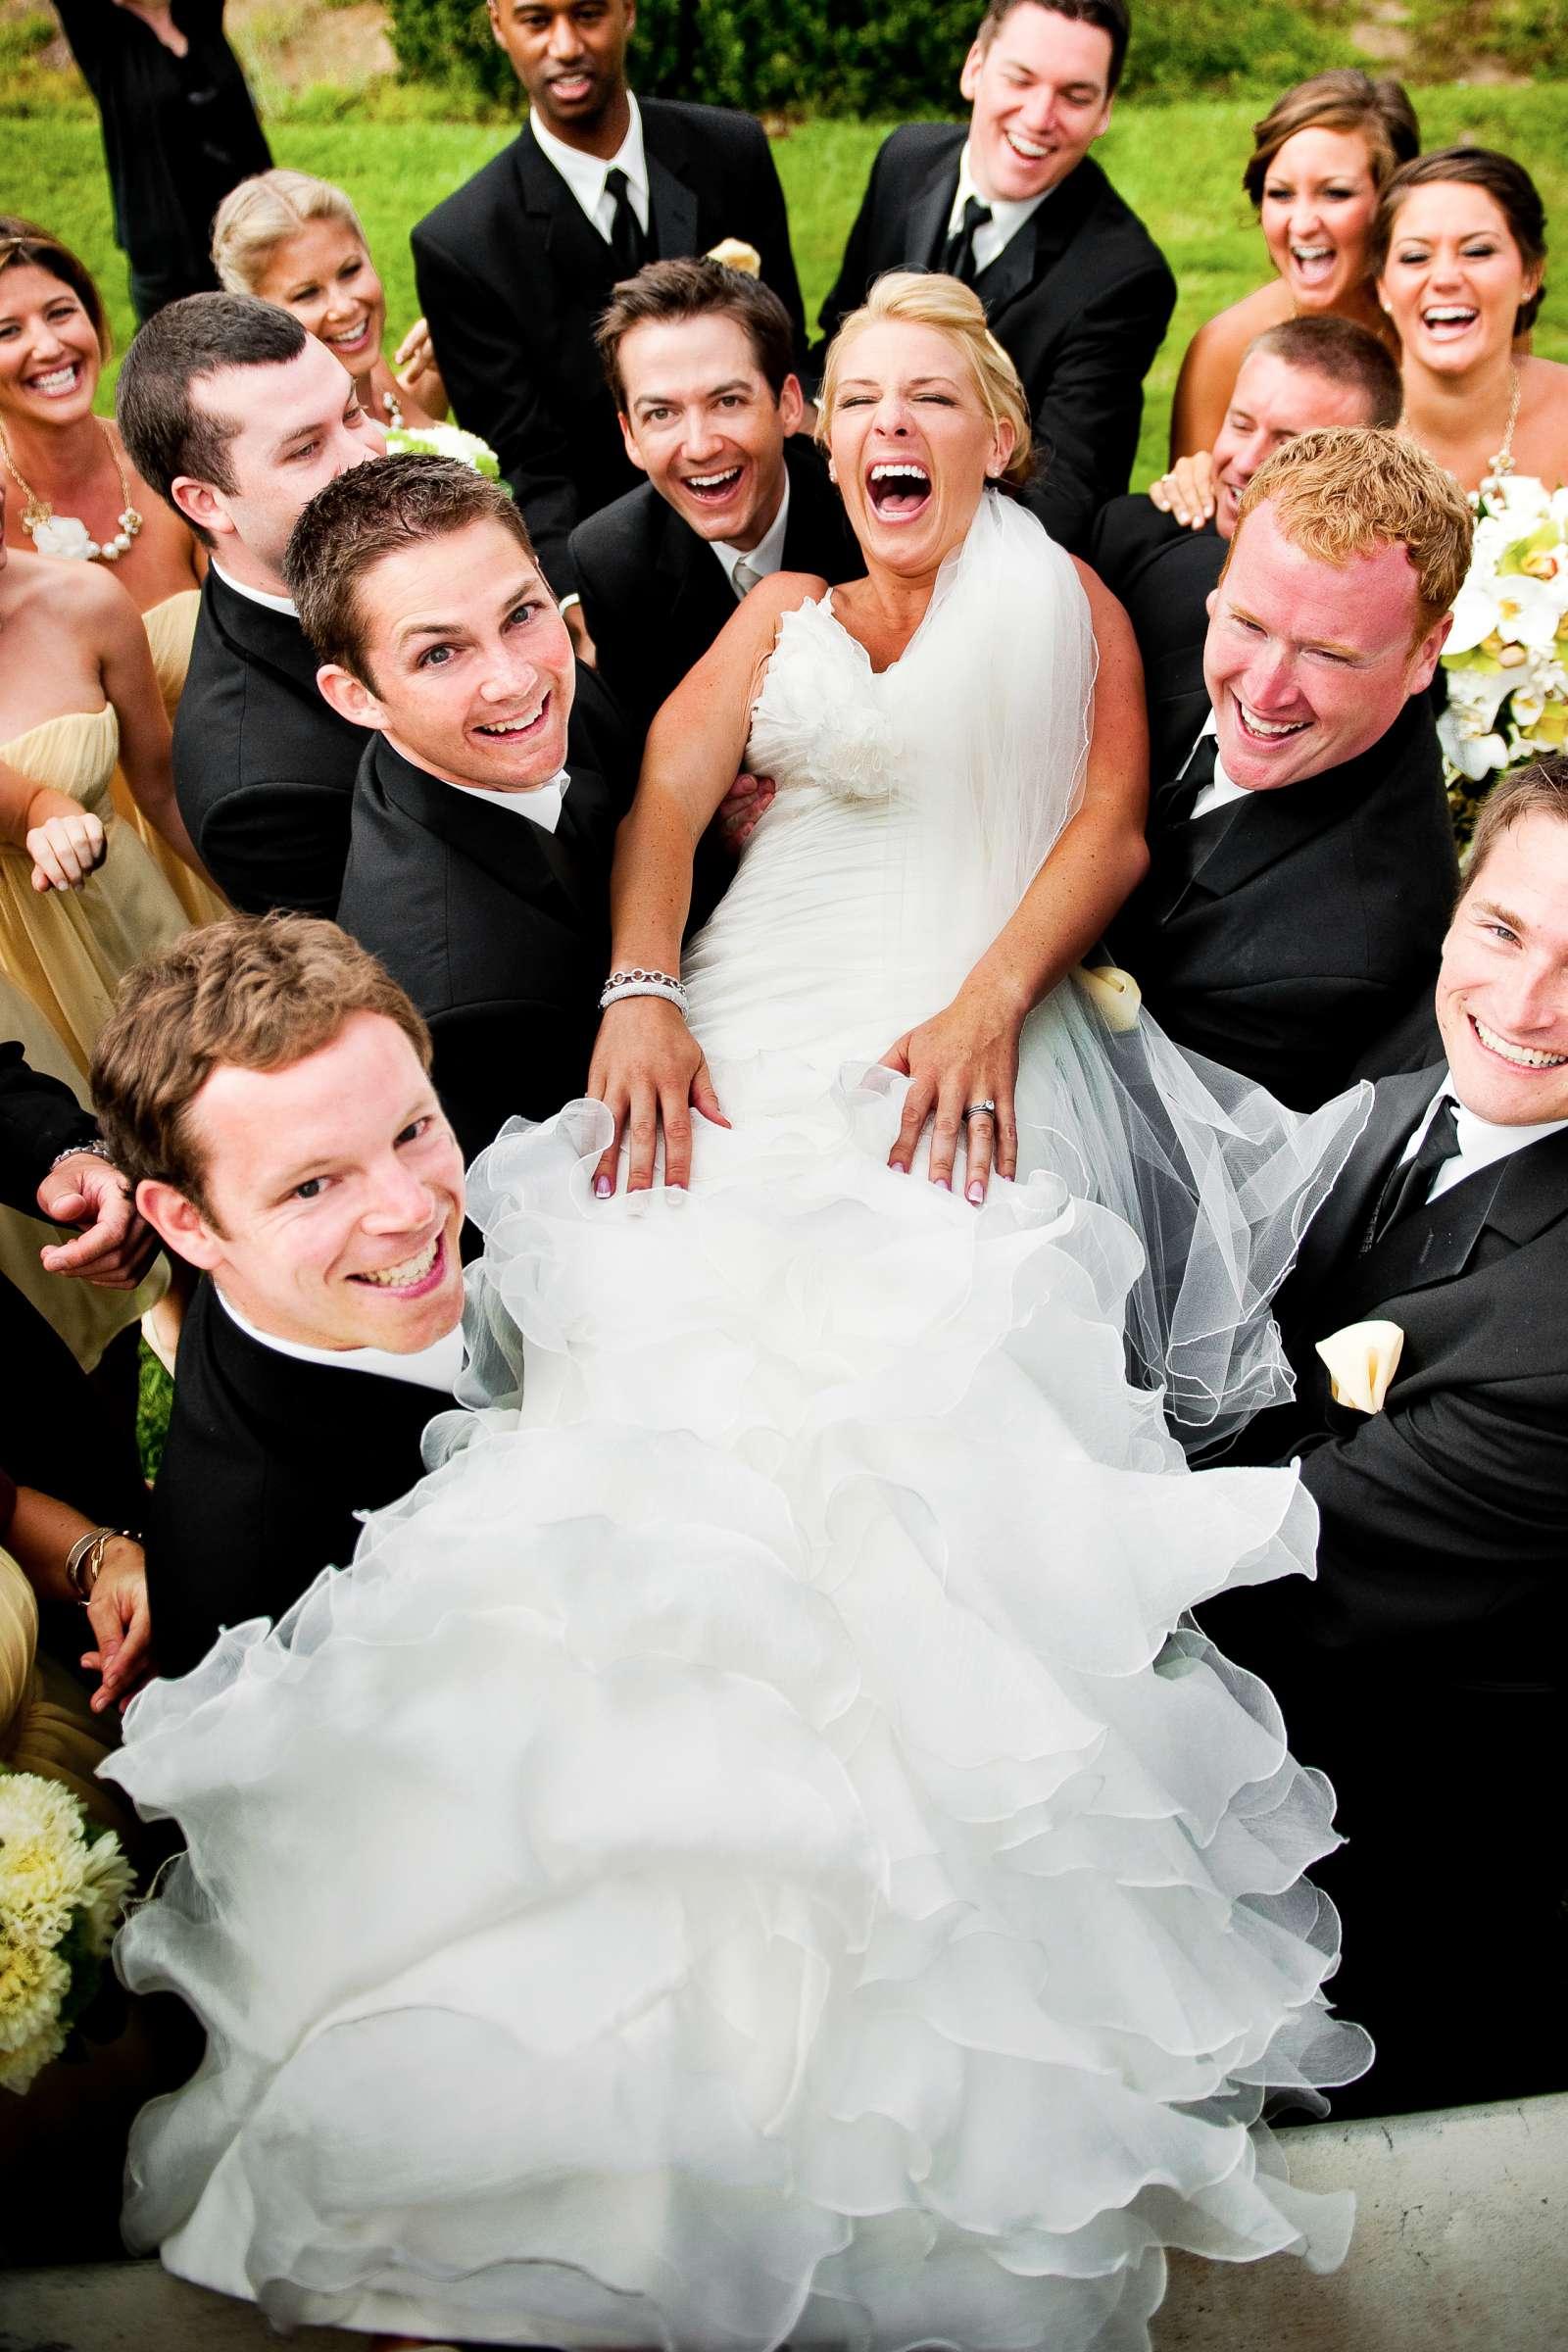 Maggie sottero bianca wedding dress celebrating raffaele for Wedding dresses in columbia sc